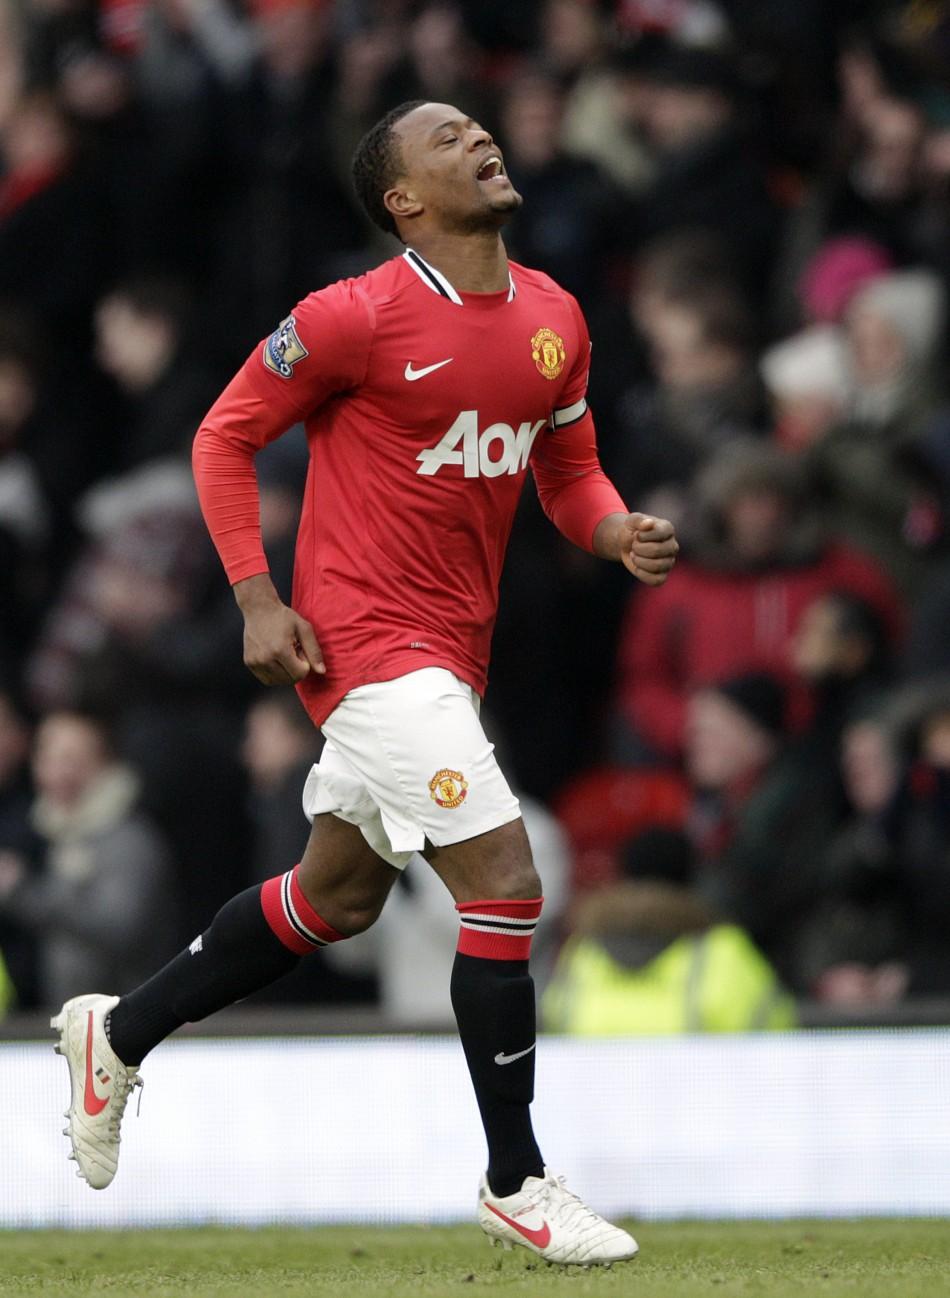 Manchester United vs. Liverpool